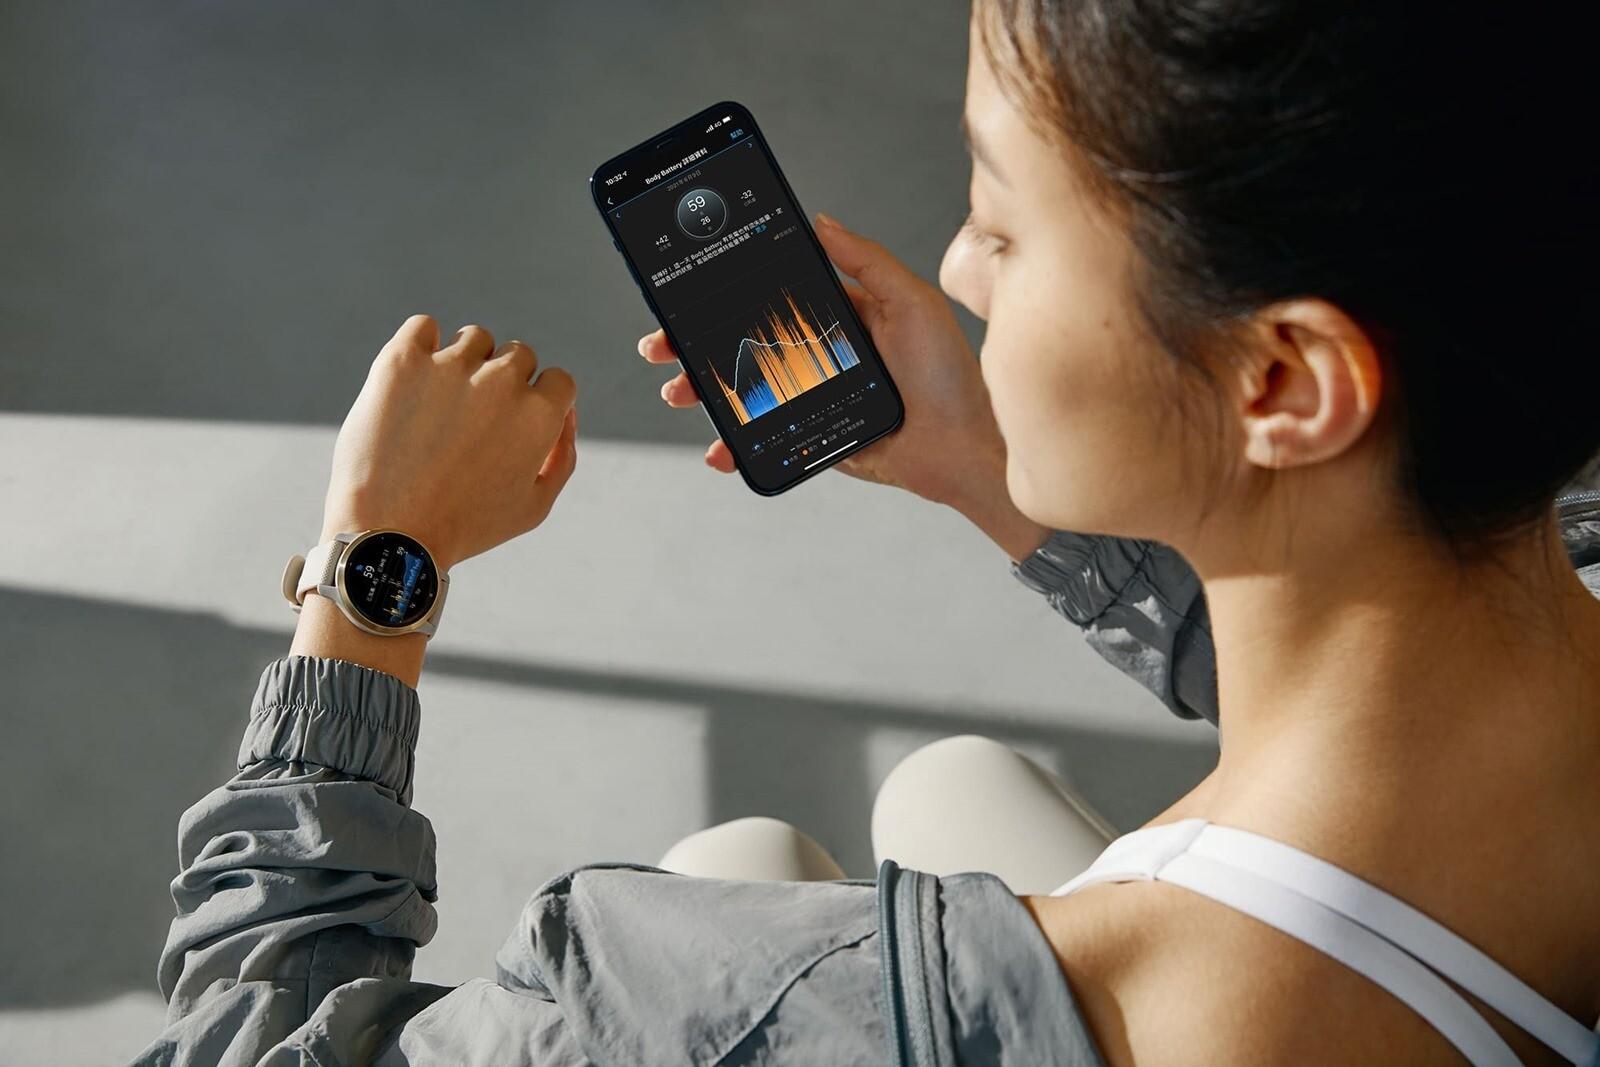 Garmin 相信透過科學化監測,追求健康有憑有據,無論是練肌肉或練出更好的睡眠習慣,健康生活都是「練」出來的_thumb.jpg @3C 達人廖阿輝